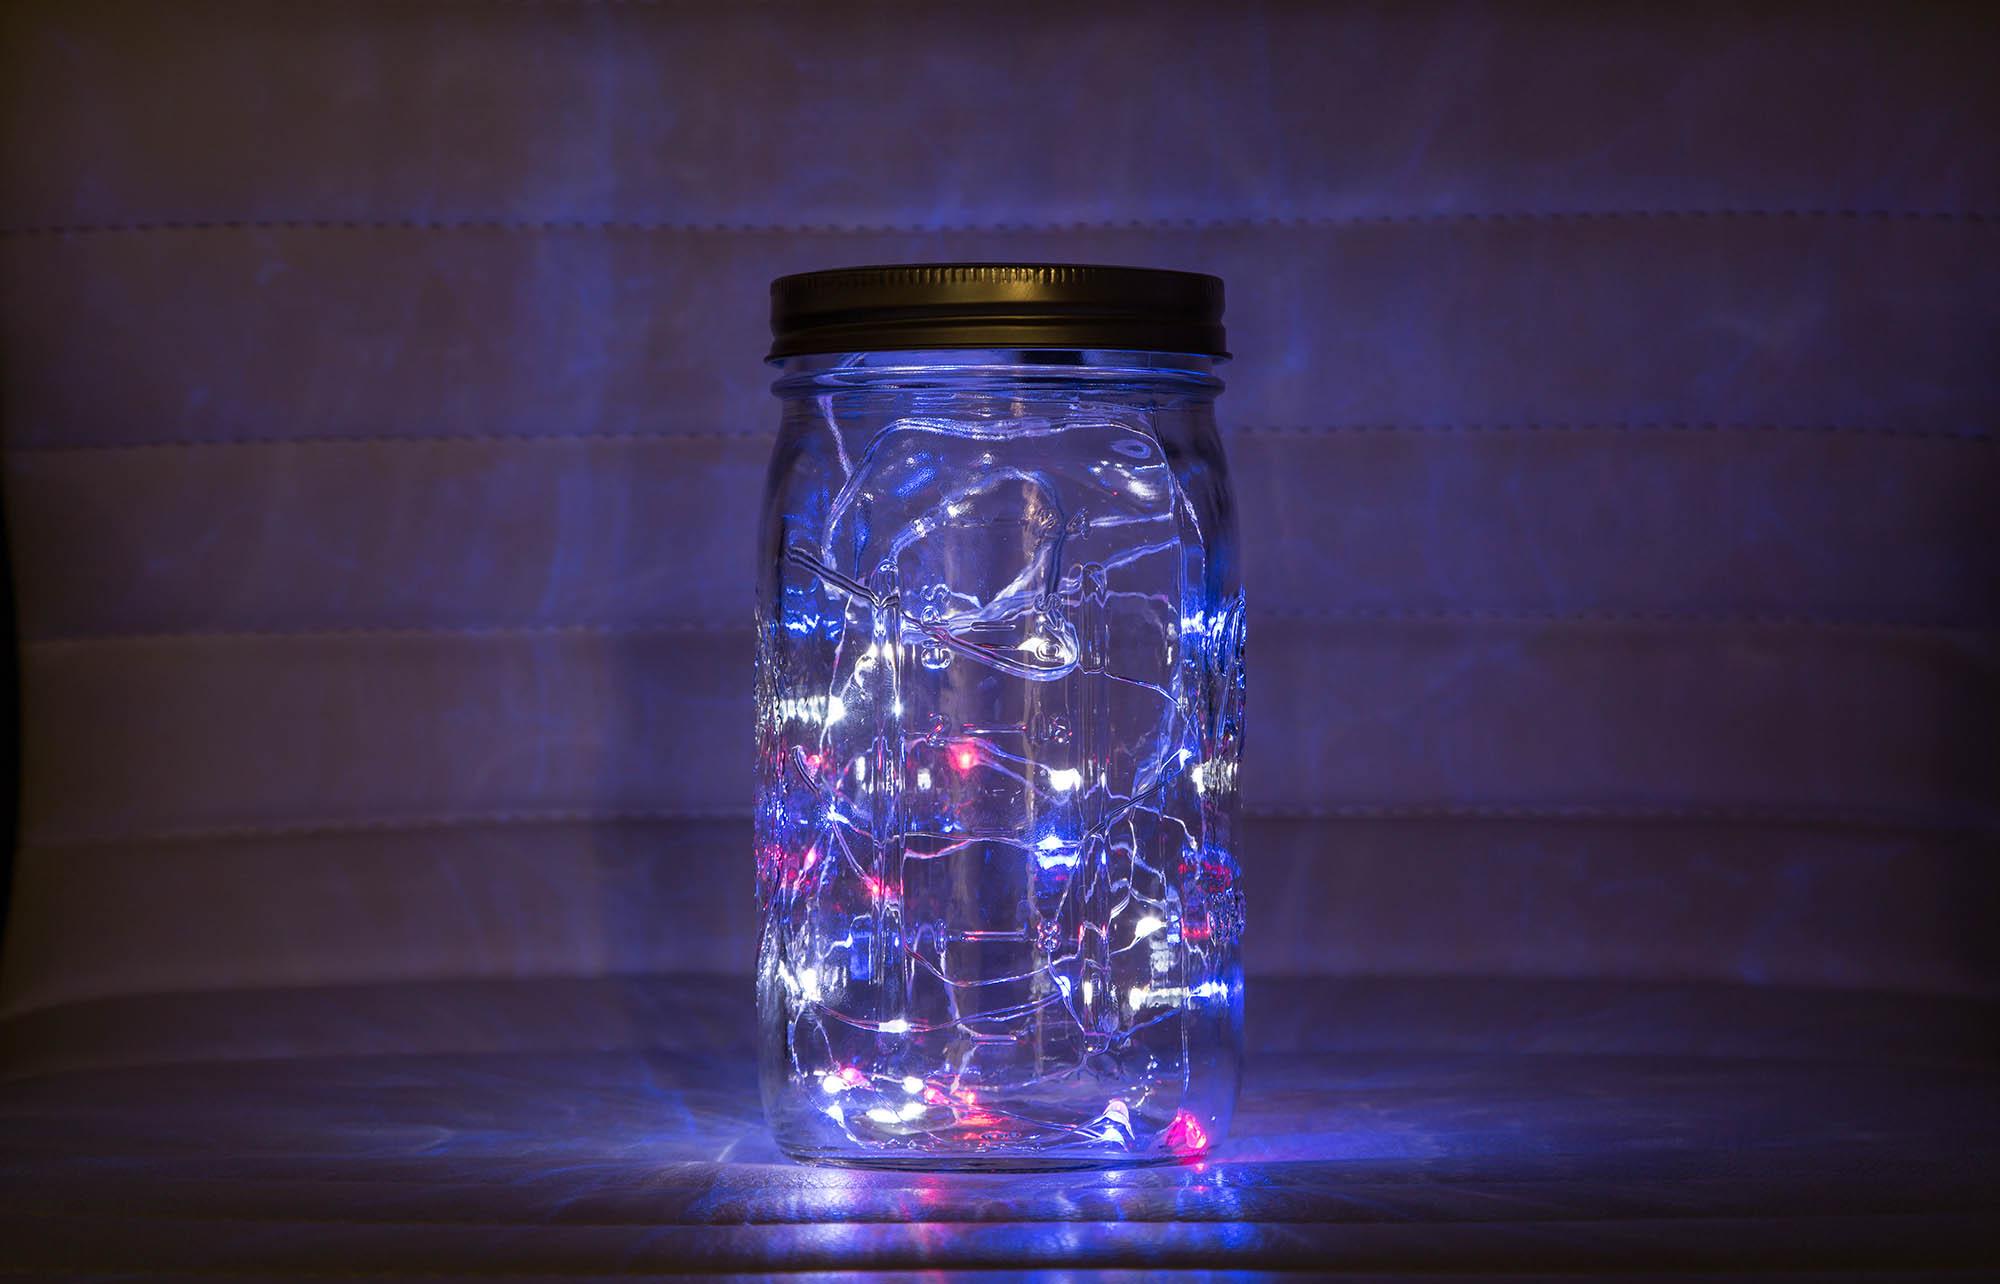 Solder Together A Fairy Lights Mason Jar Make Making Parts And Wiring Supplies Craft Lighting Kits Night Light